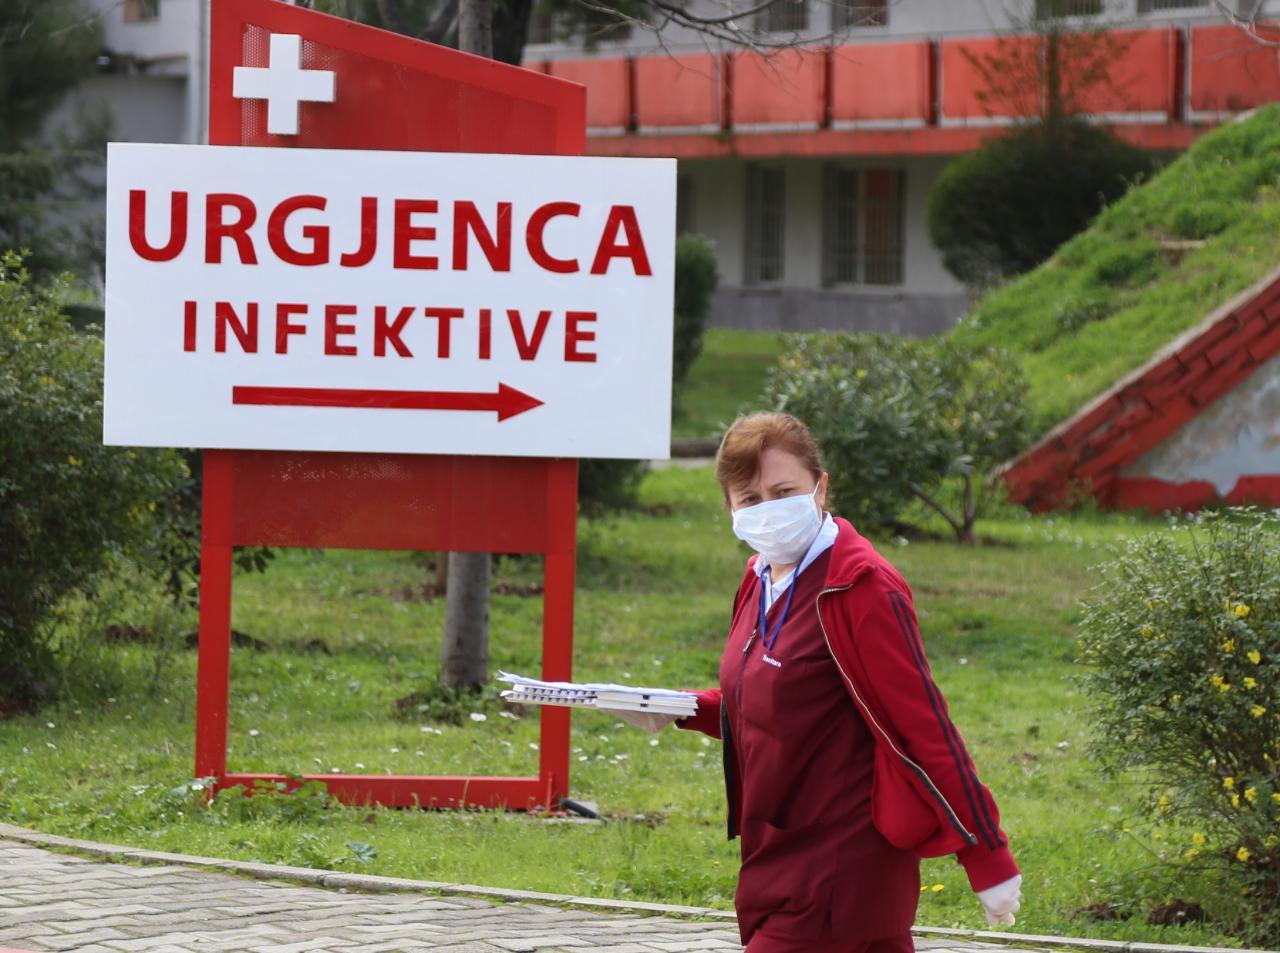 koronavirusi-infektivi-urgjenca17-1